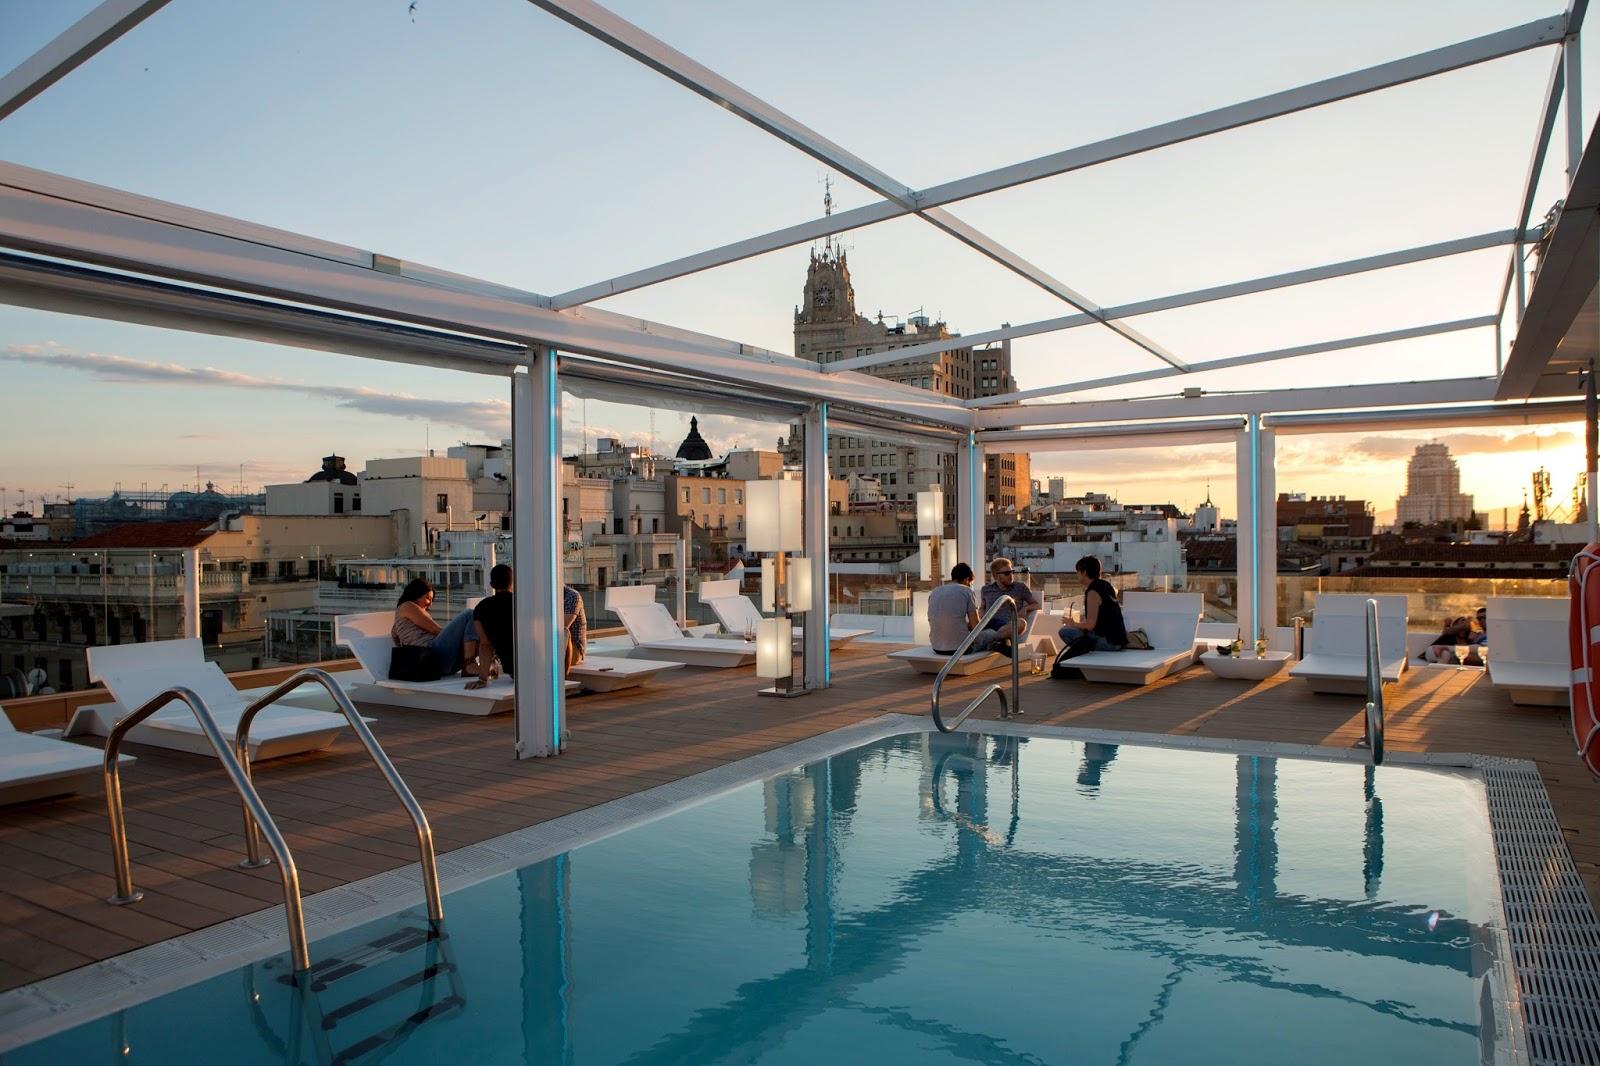 Las 10 mejores piscinas de hotel espa olas for Piscinas azoteas madrid